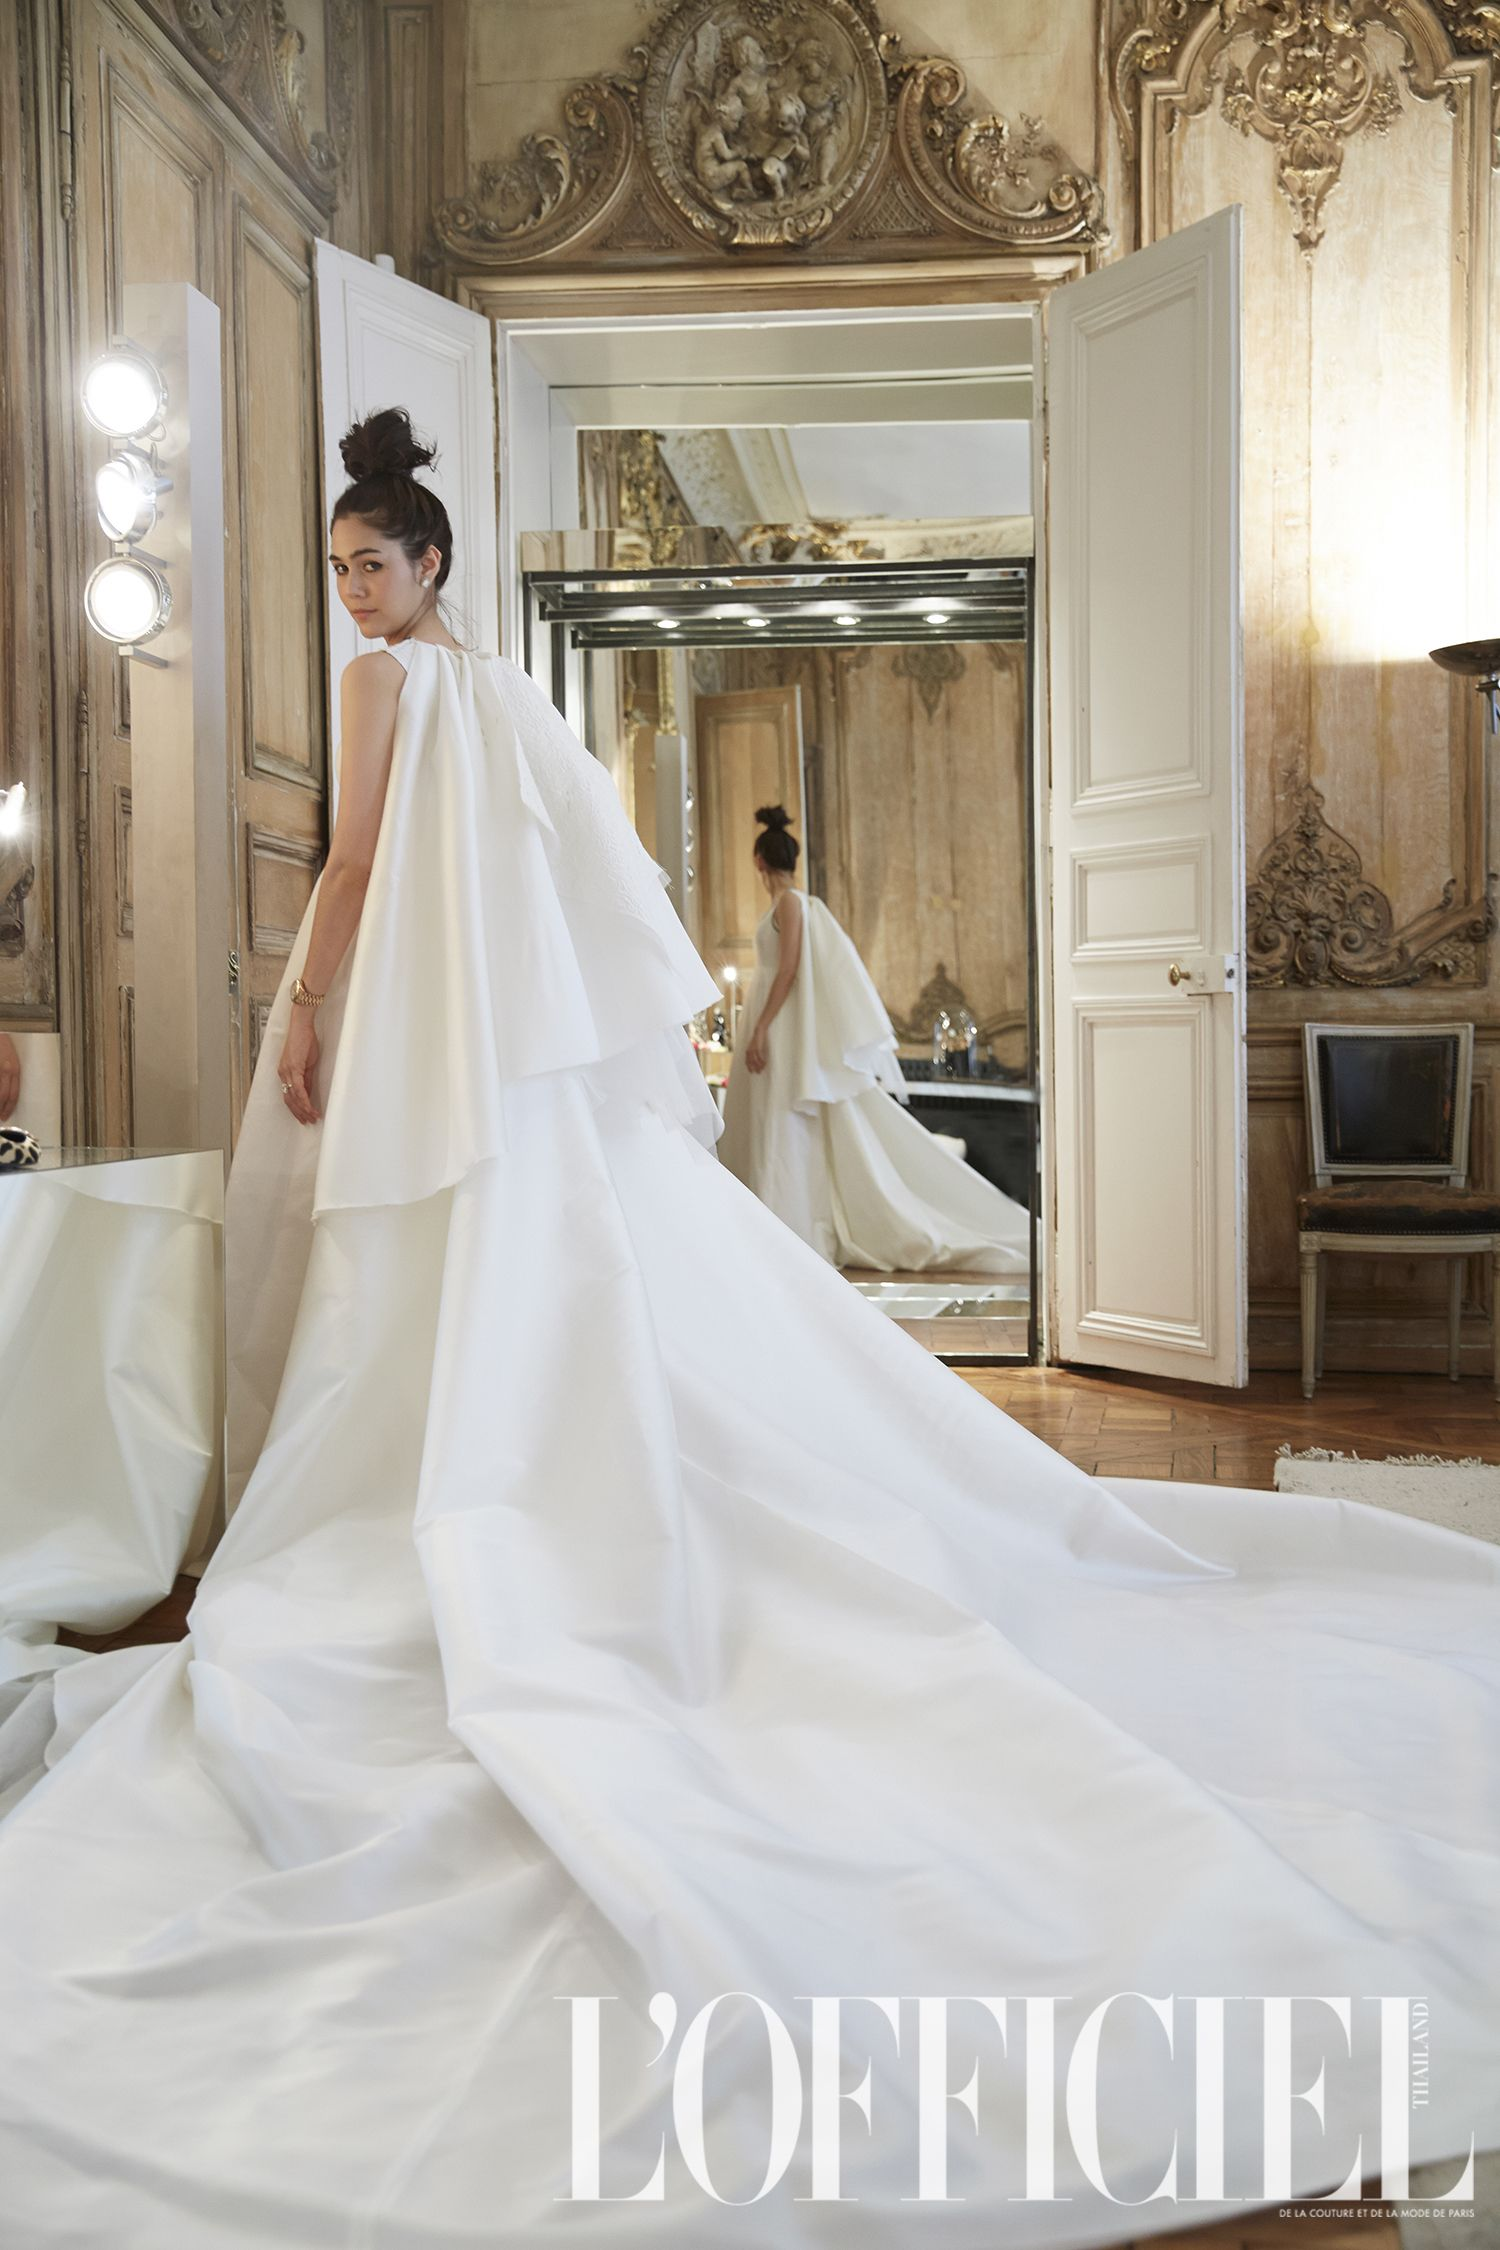 LOfficielThailand-Chompoo-Wedding-giambattista valli-6 | Editorial ...